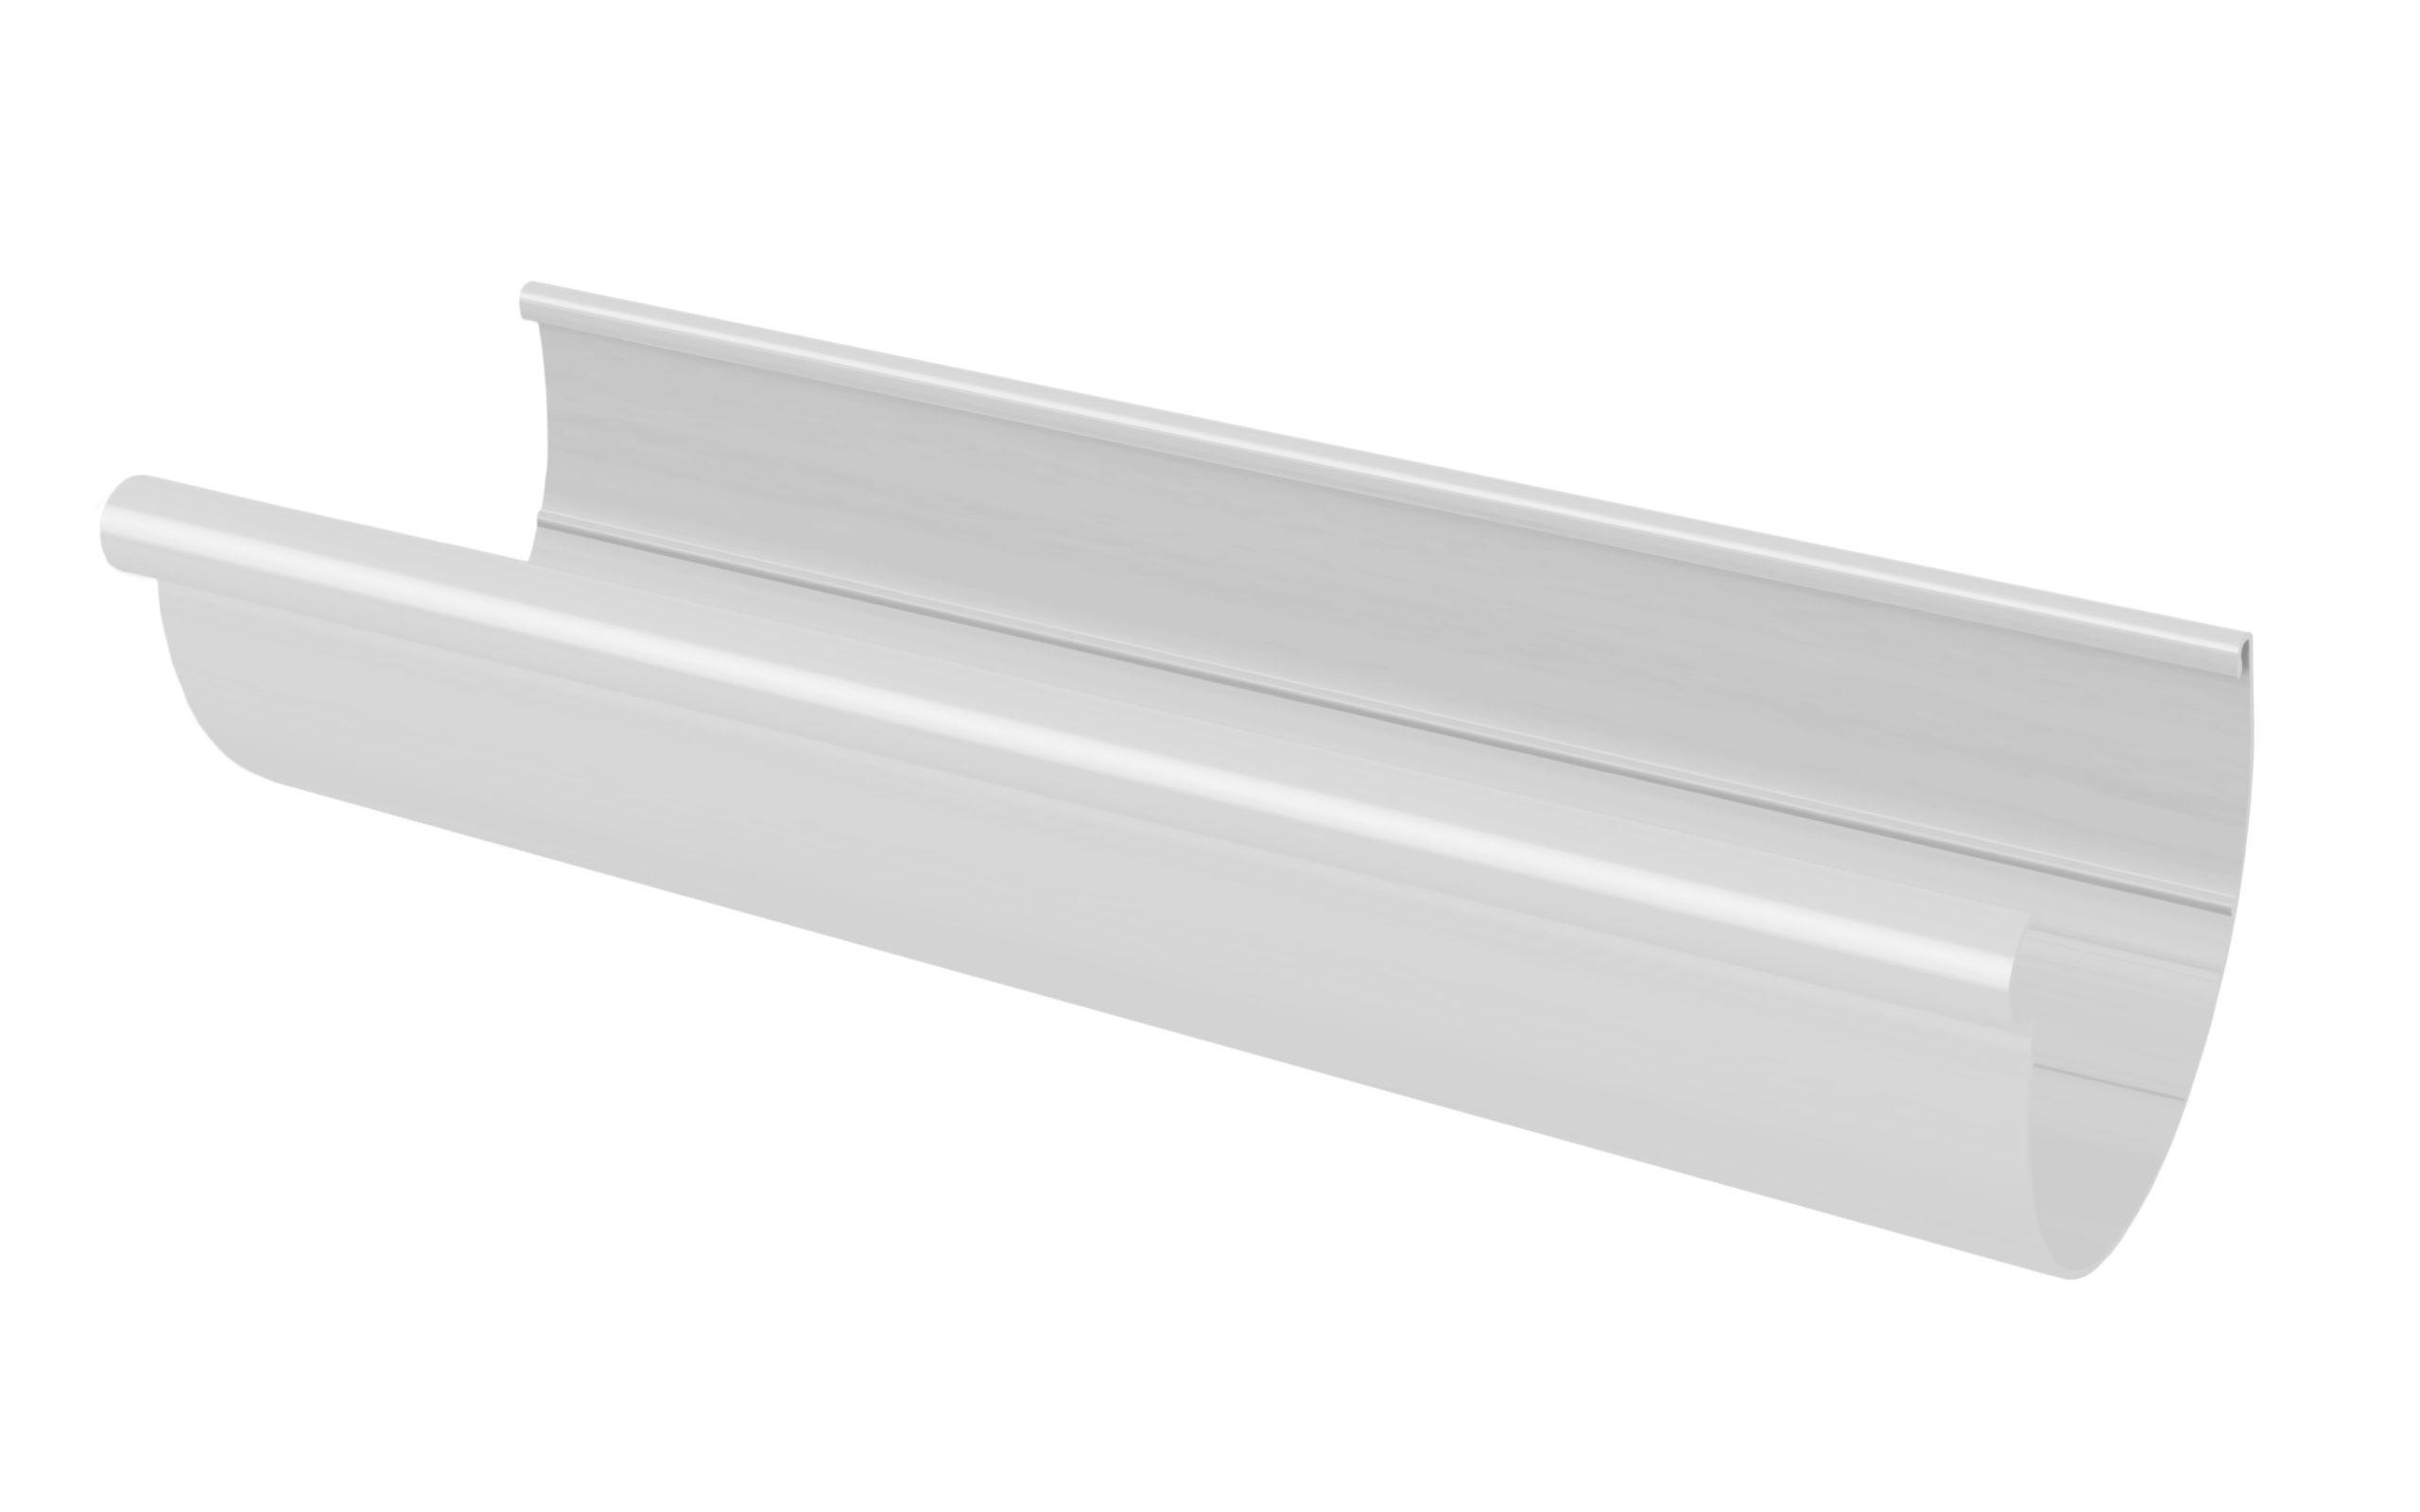 Ринва, біла 120мм/Ø довжина 3м Runner